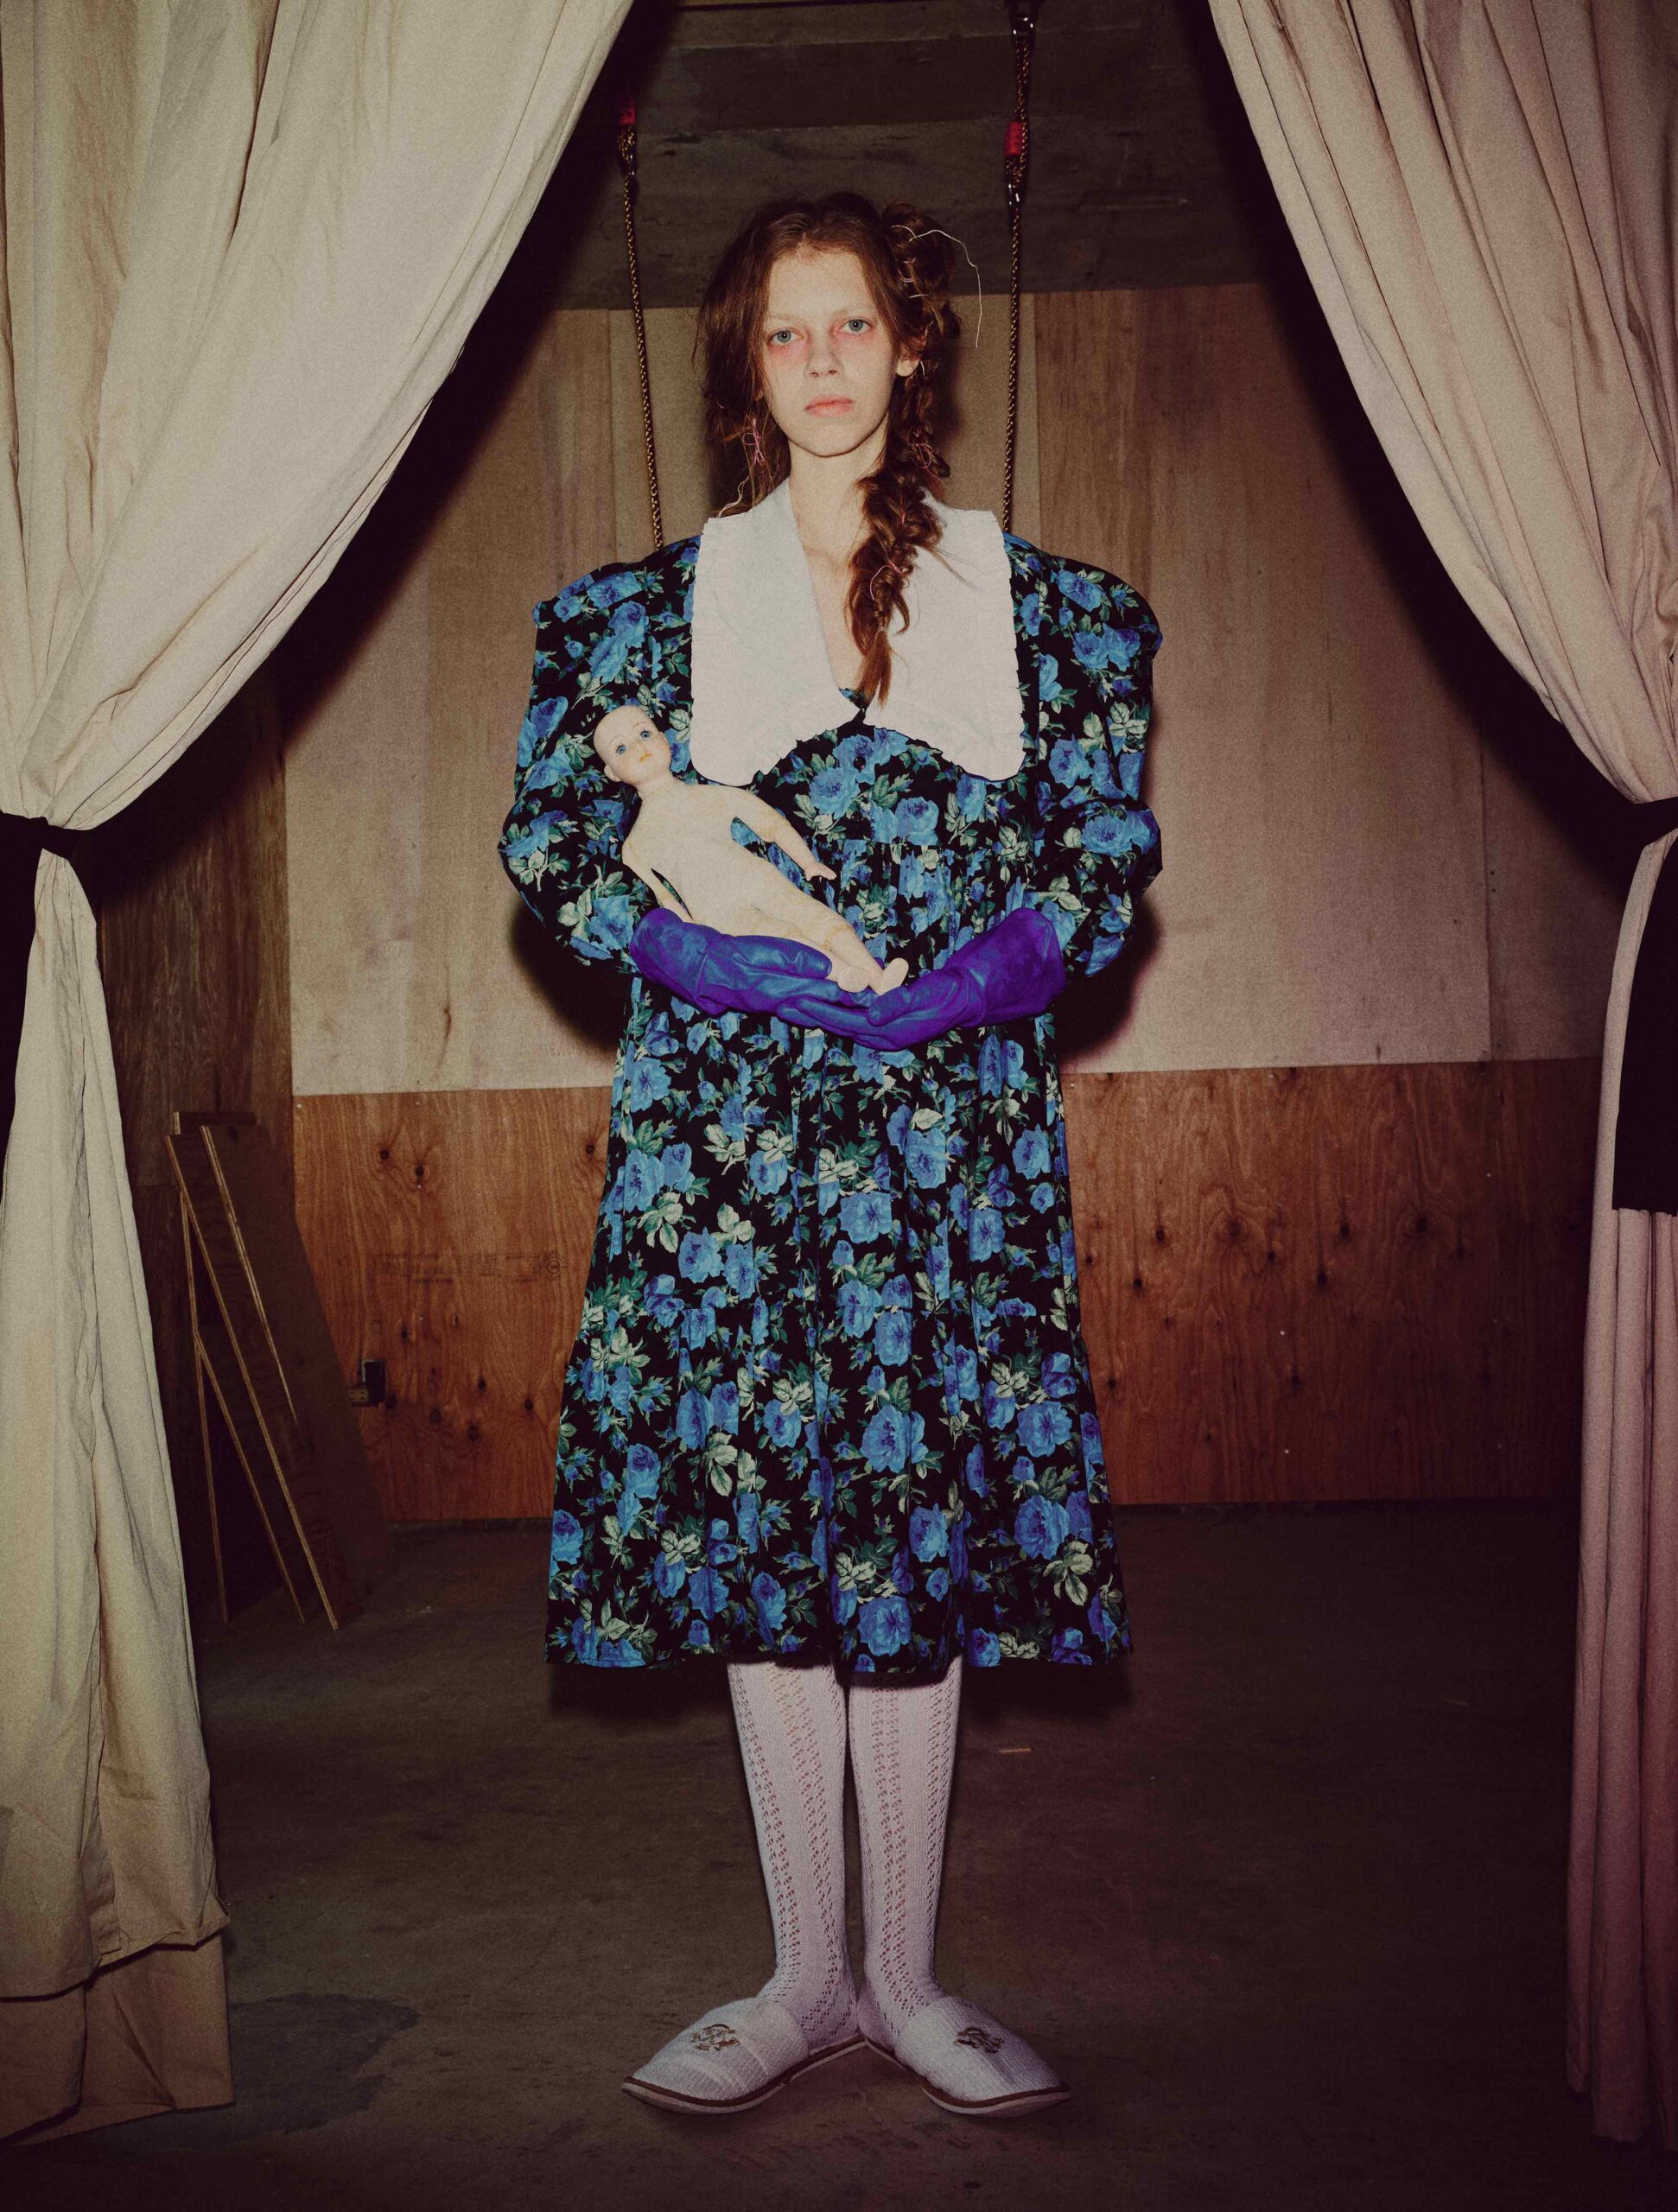 Melampo-Hausaufgaben-Collection-flower-maxi-collar-dress